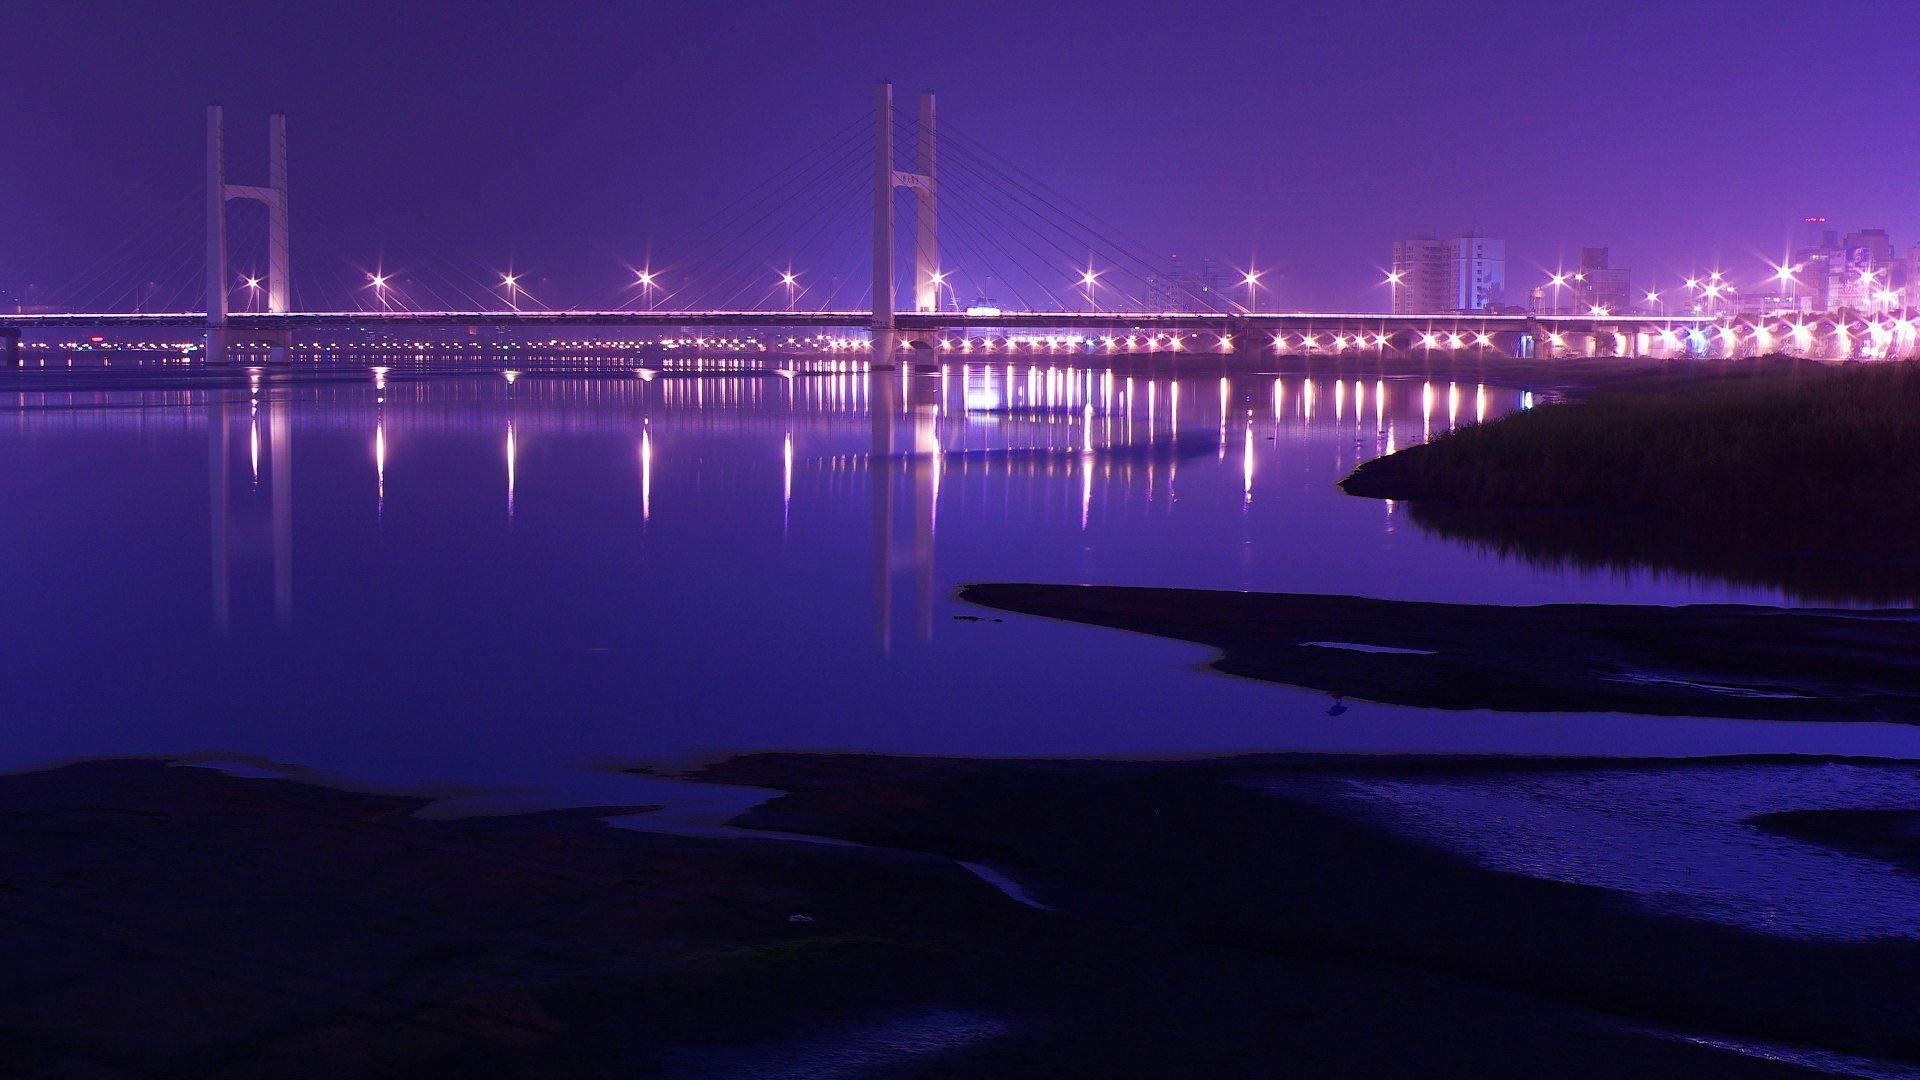 bridge at night wallpaper background